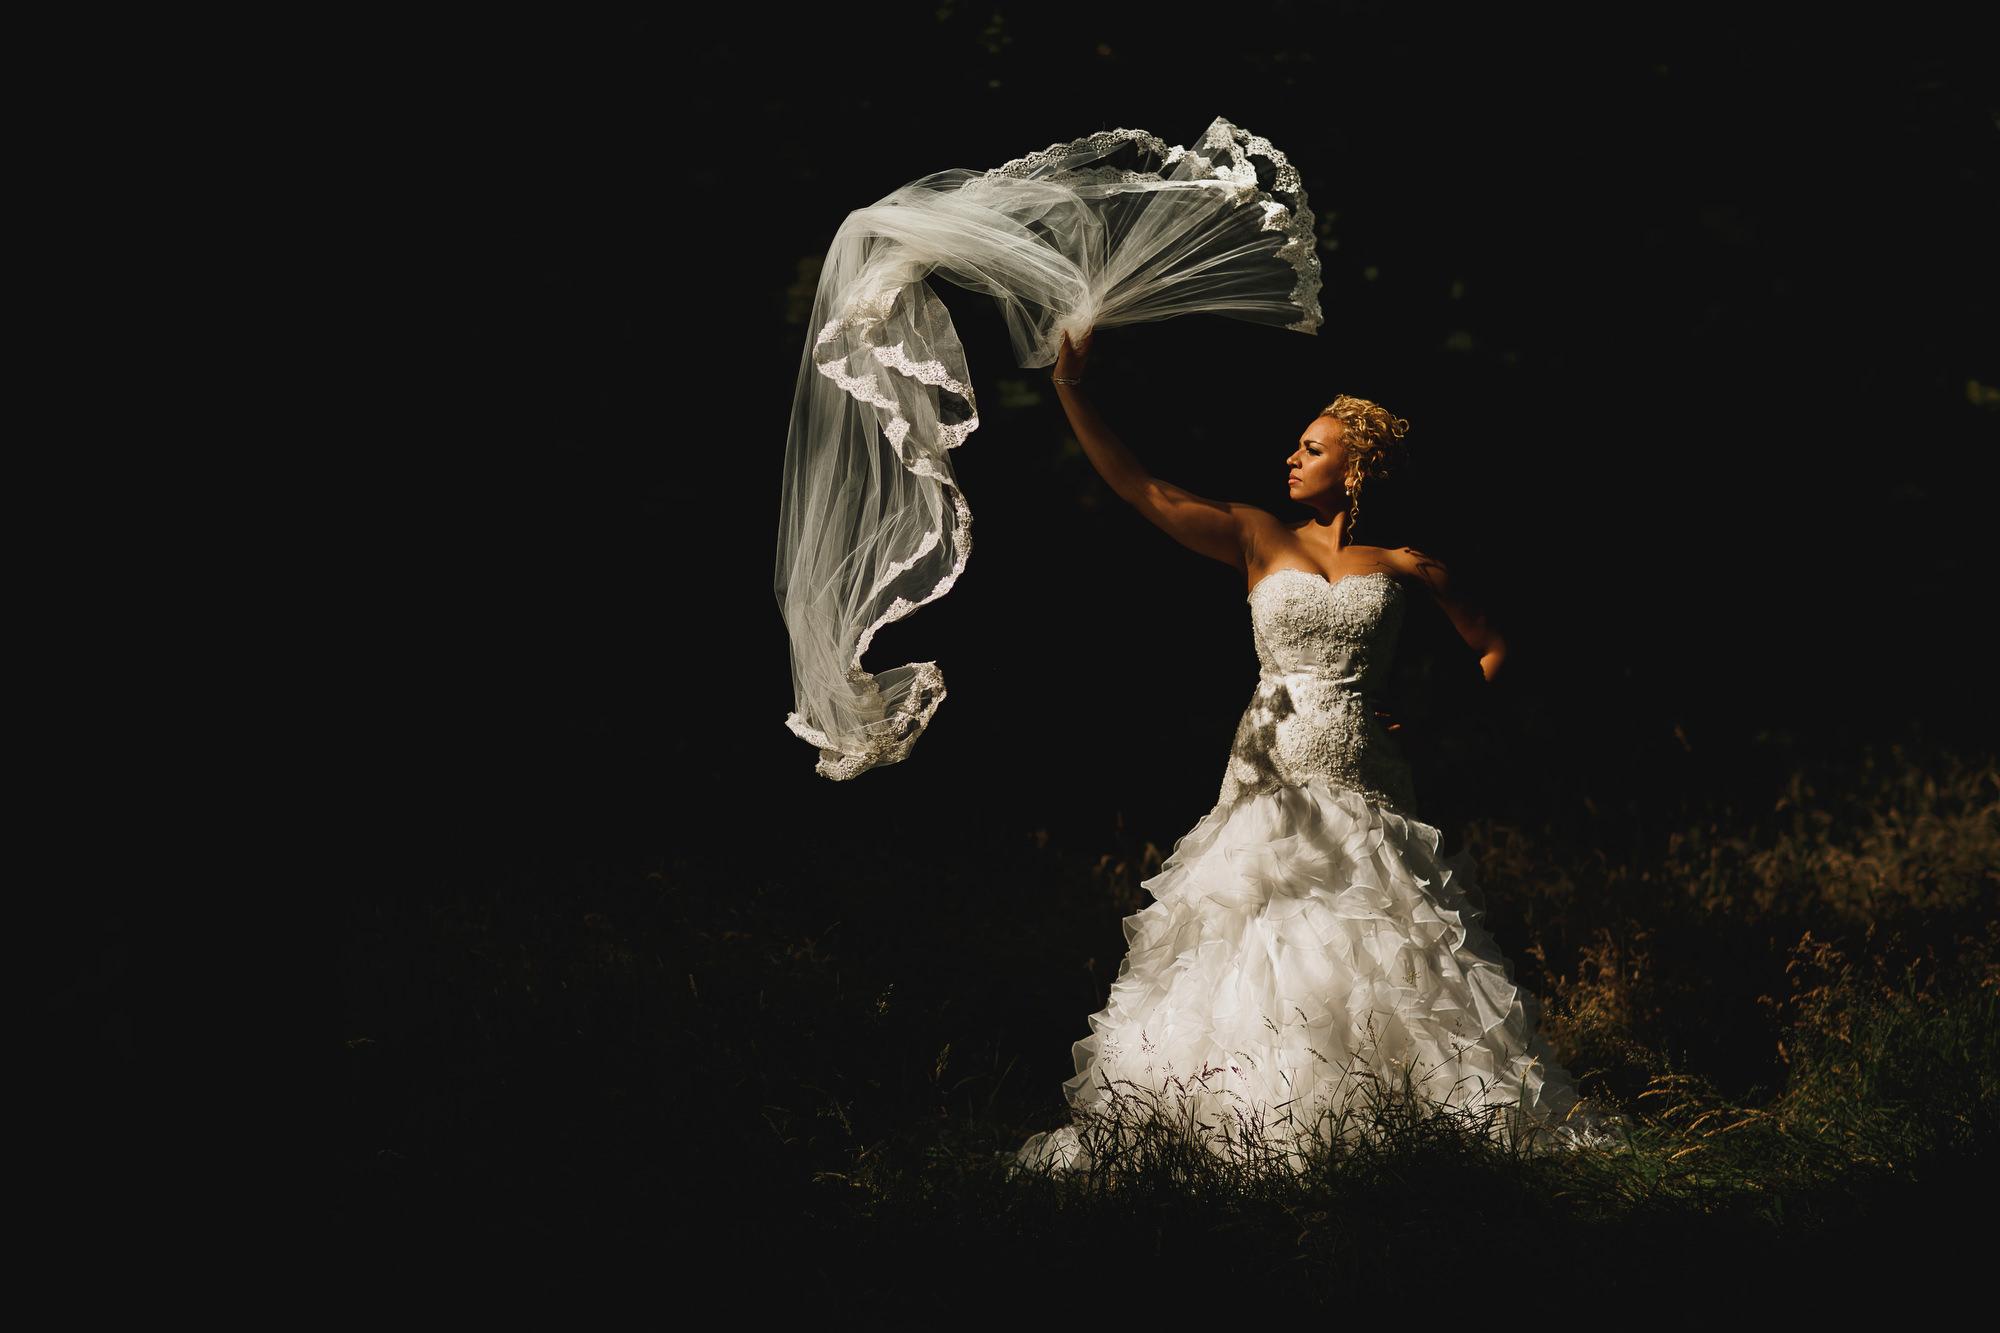 Matt Wing Photo - Award Winning Essex Wedding Photographer Award winning wedding photographers uk